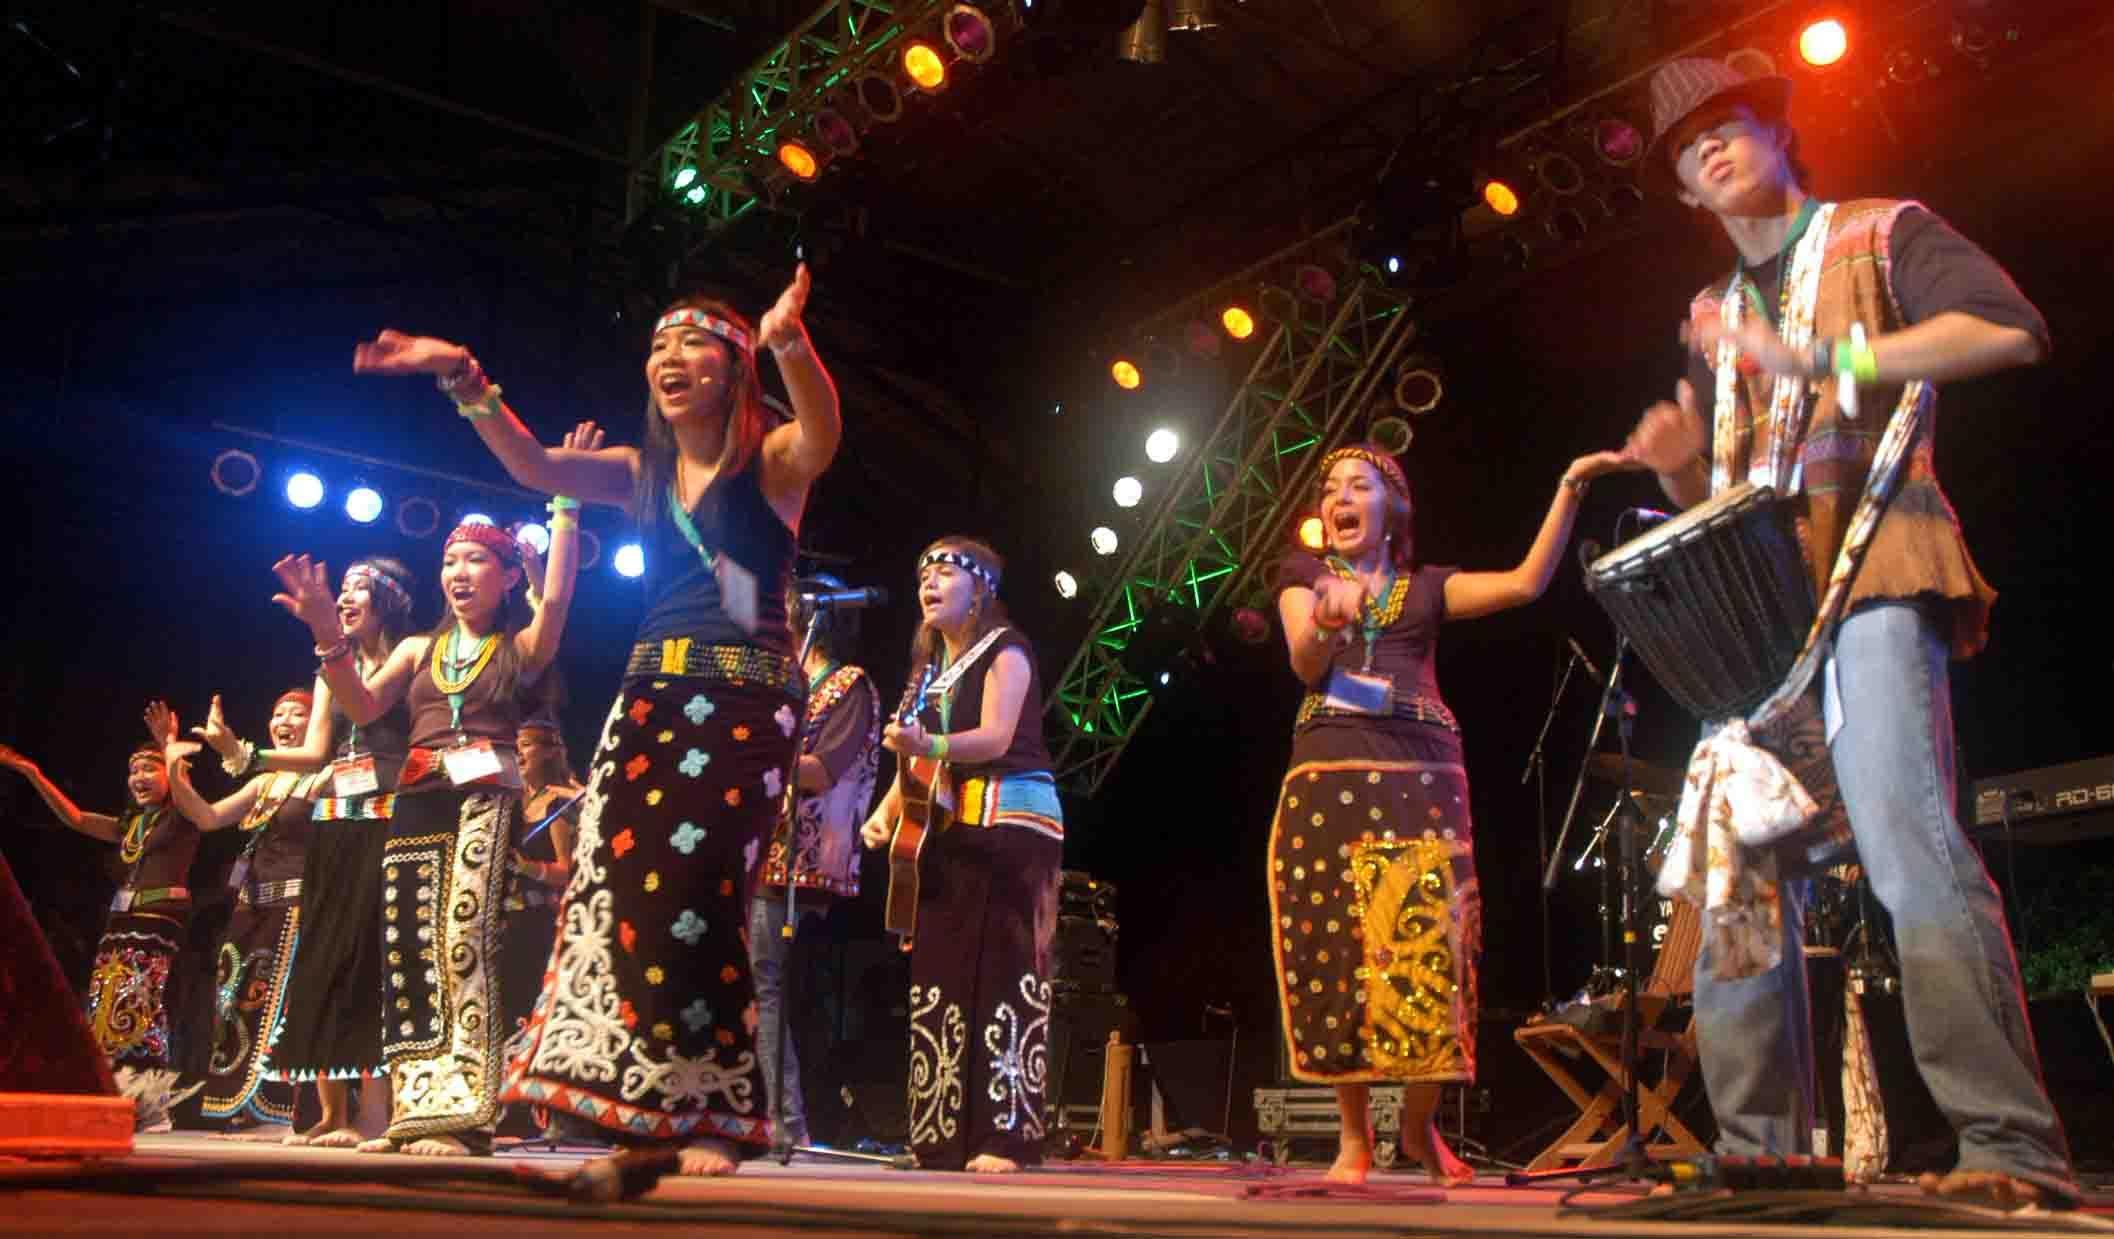 Sarawak: A world of music and crafts